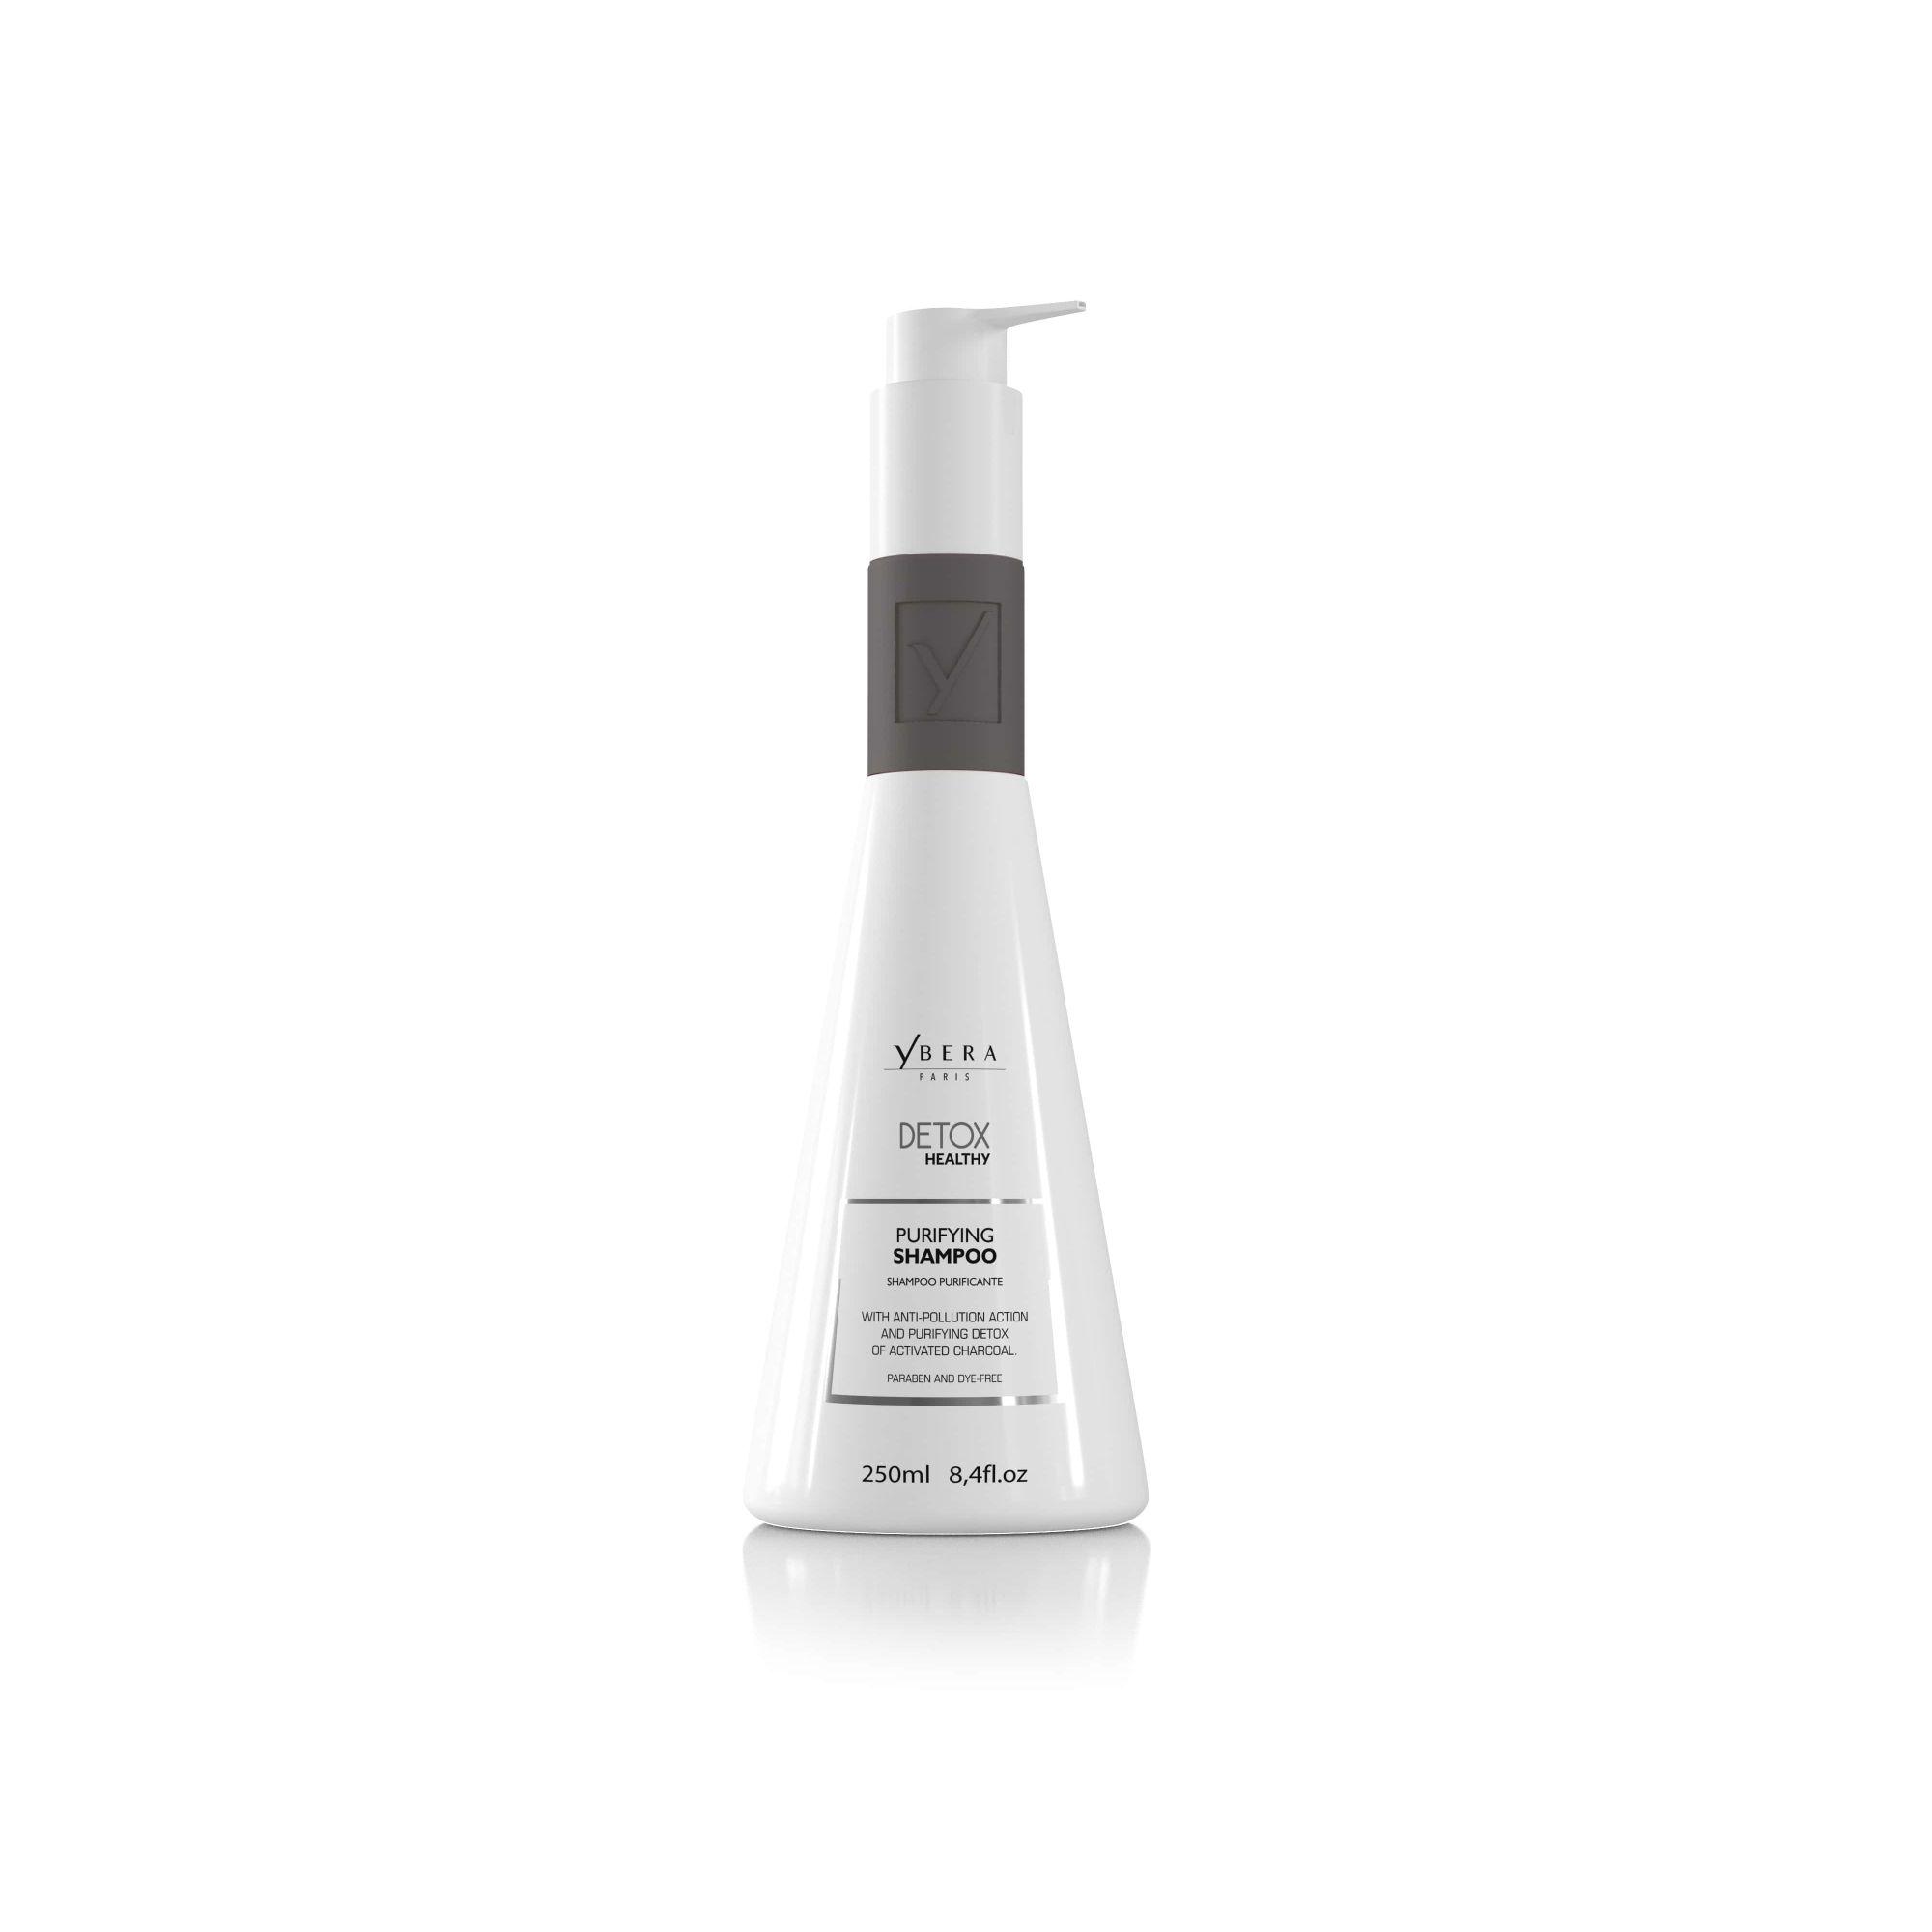 Shampoo Manutenção Detox Healthy Ybera Paris 250ml